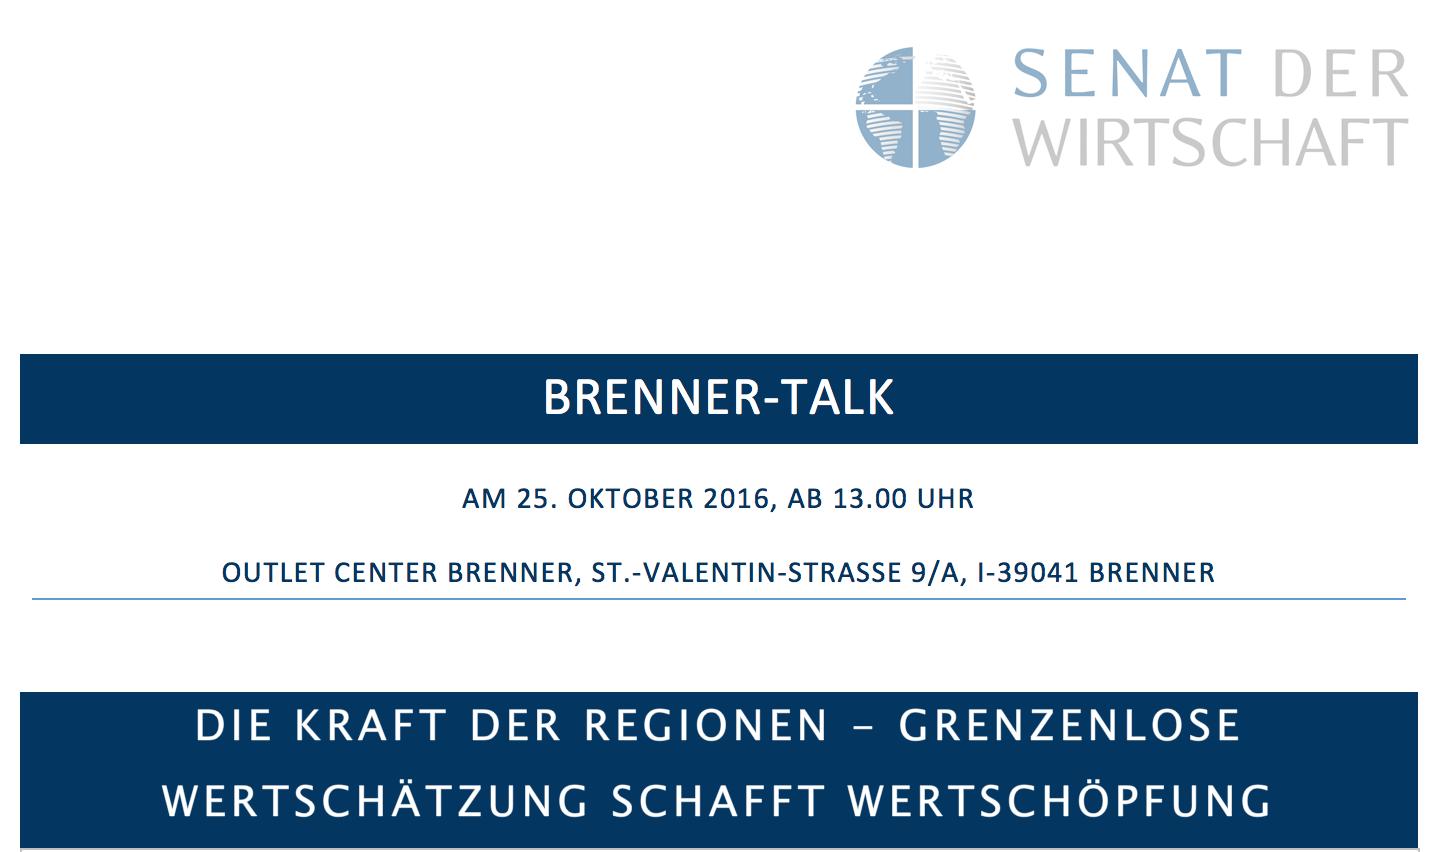 SdW-Brenner-Talk - Einladung 2016-10-25